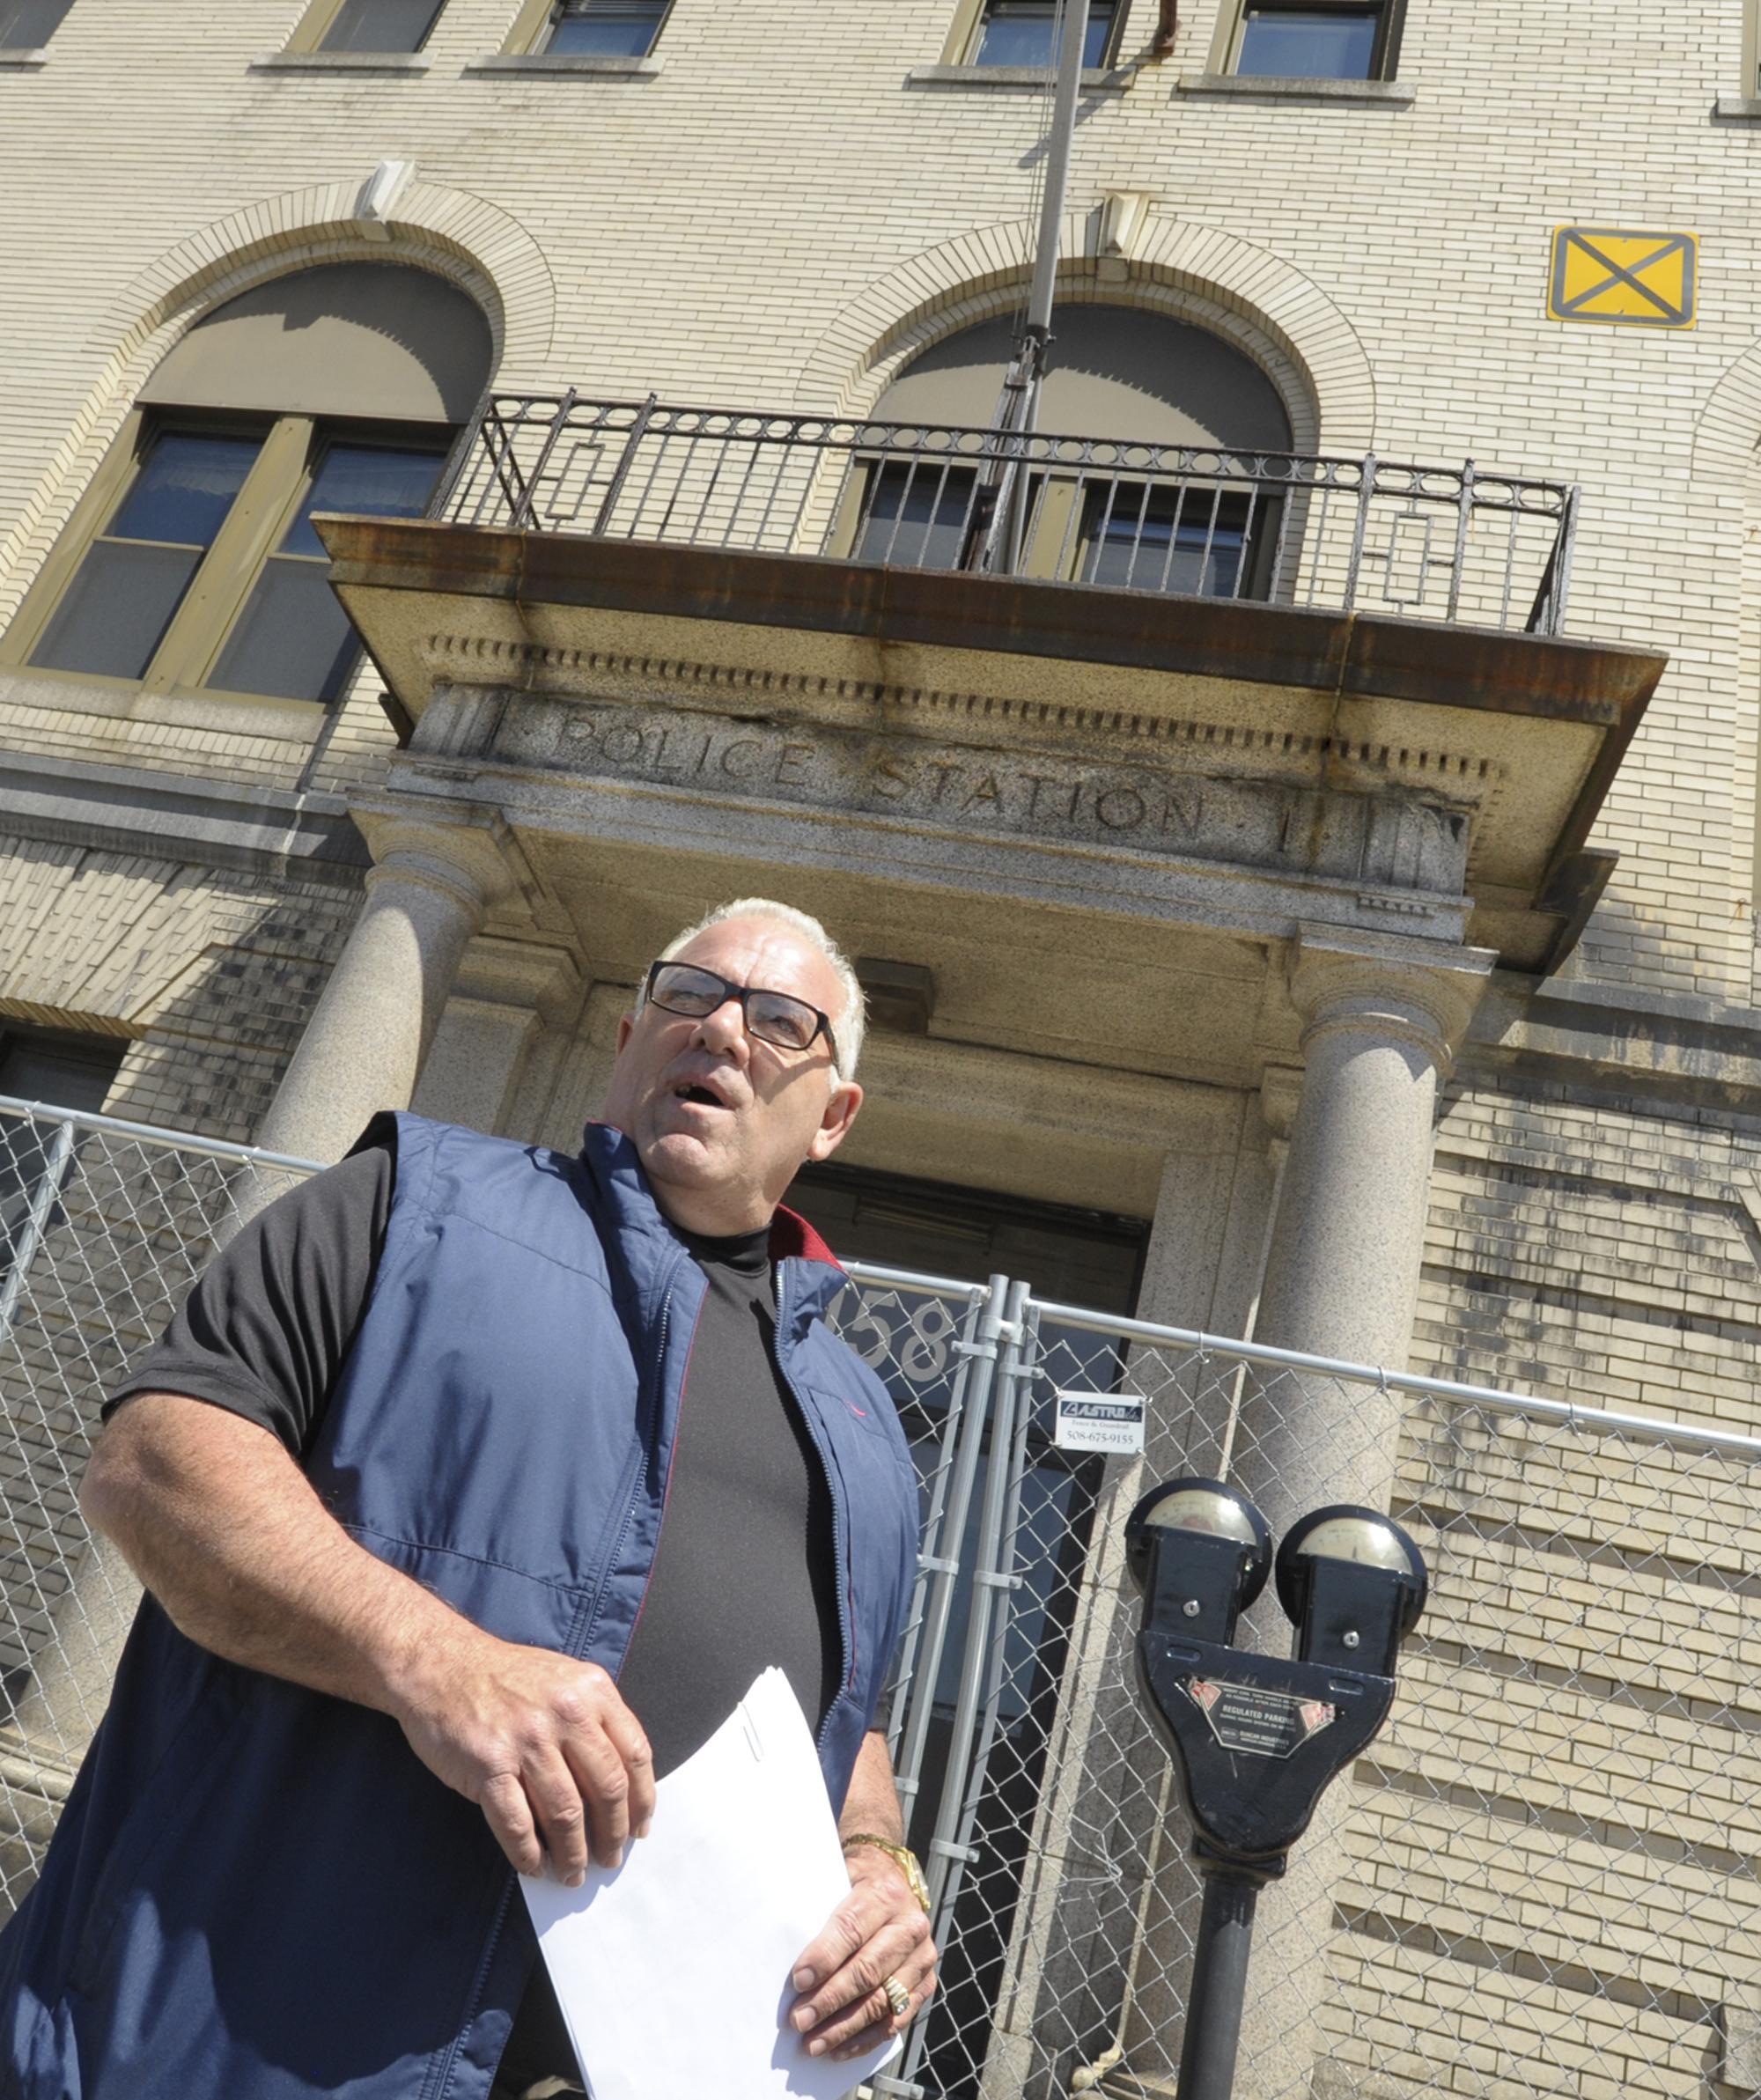 Alleged New England Mafia Member Ruggiero Receives Bump Up, Per Sources